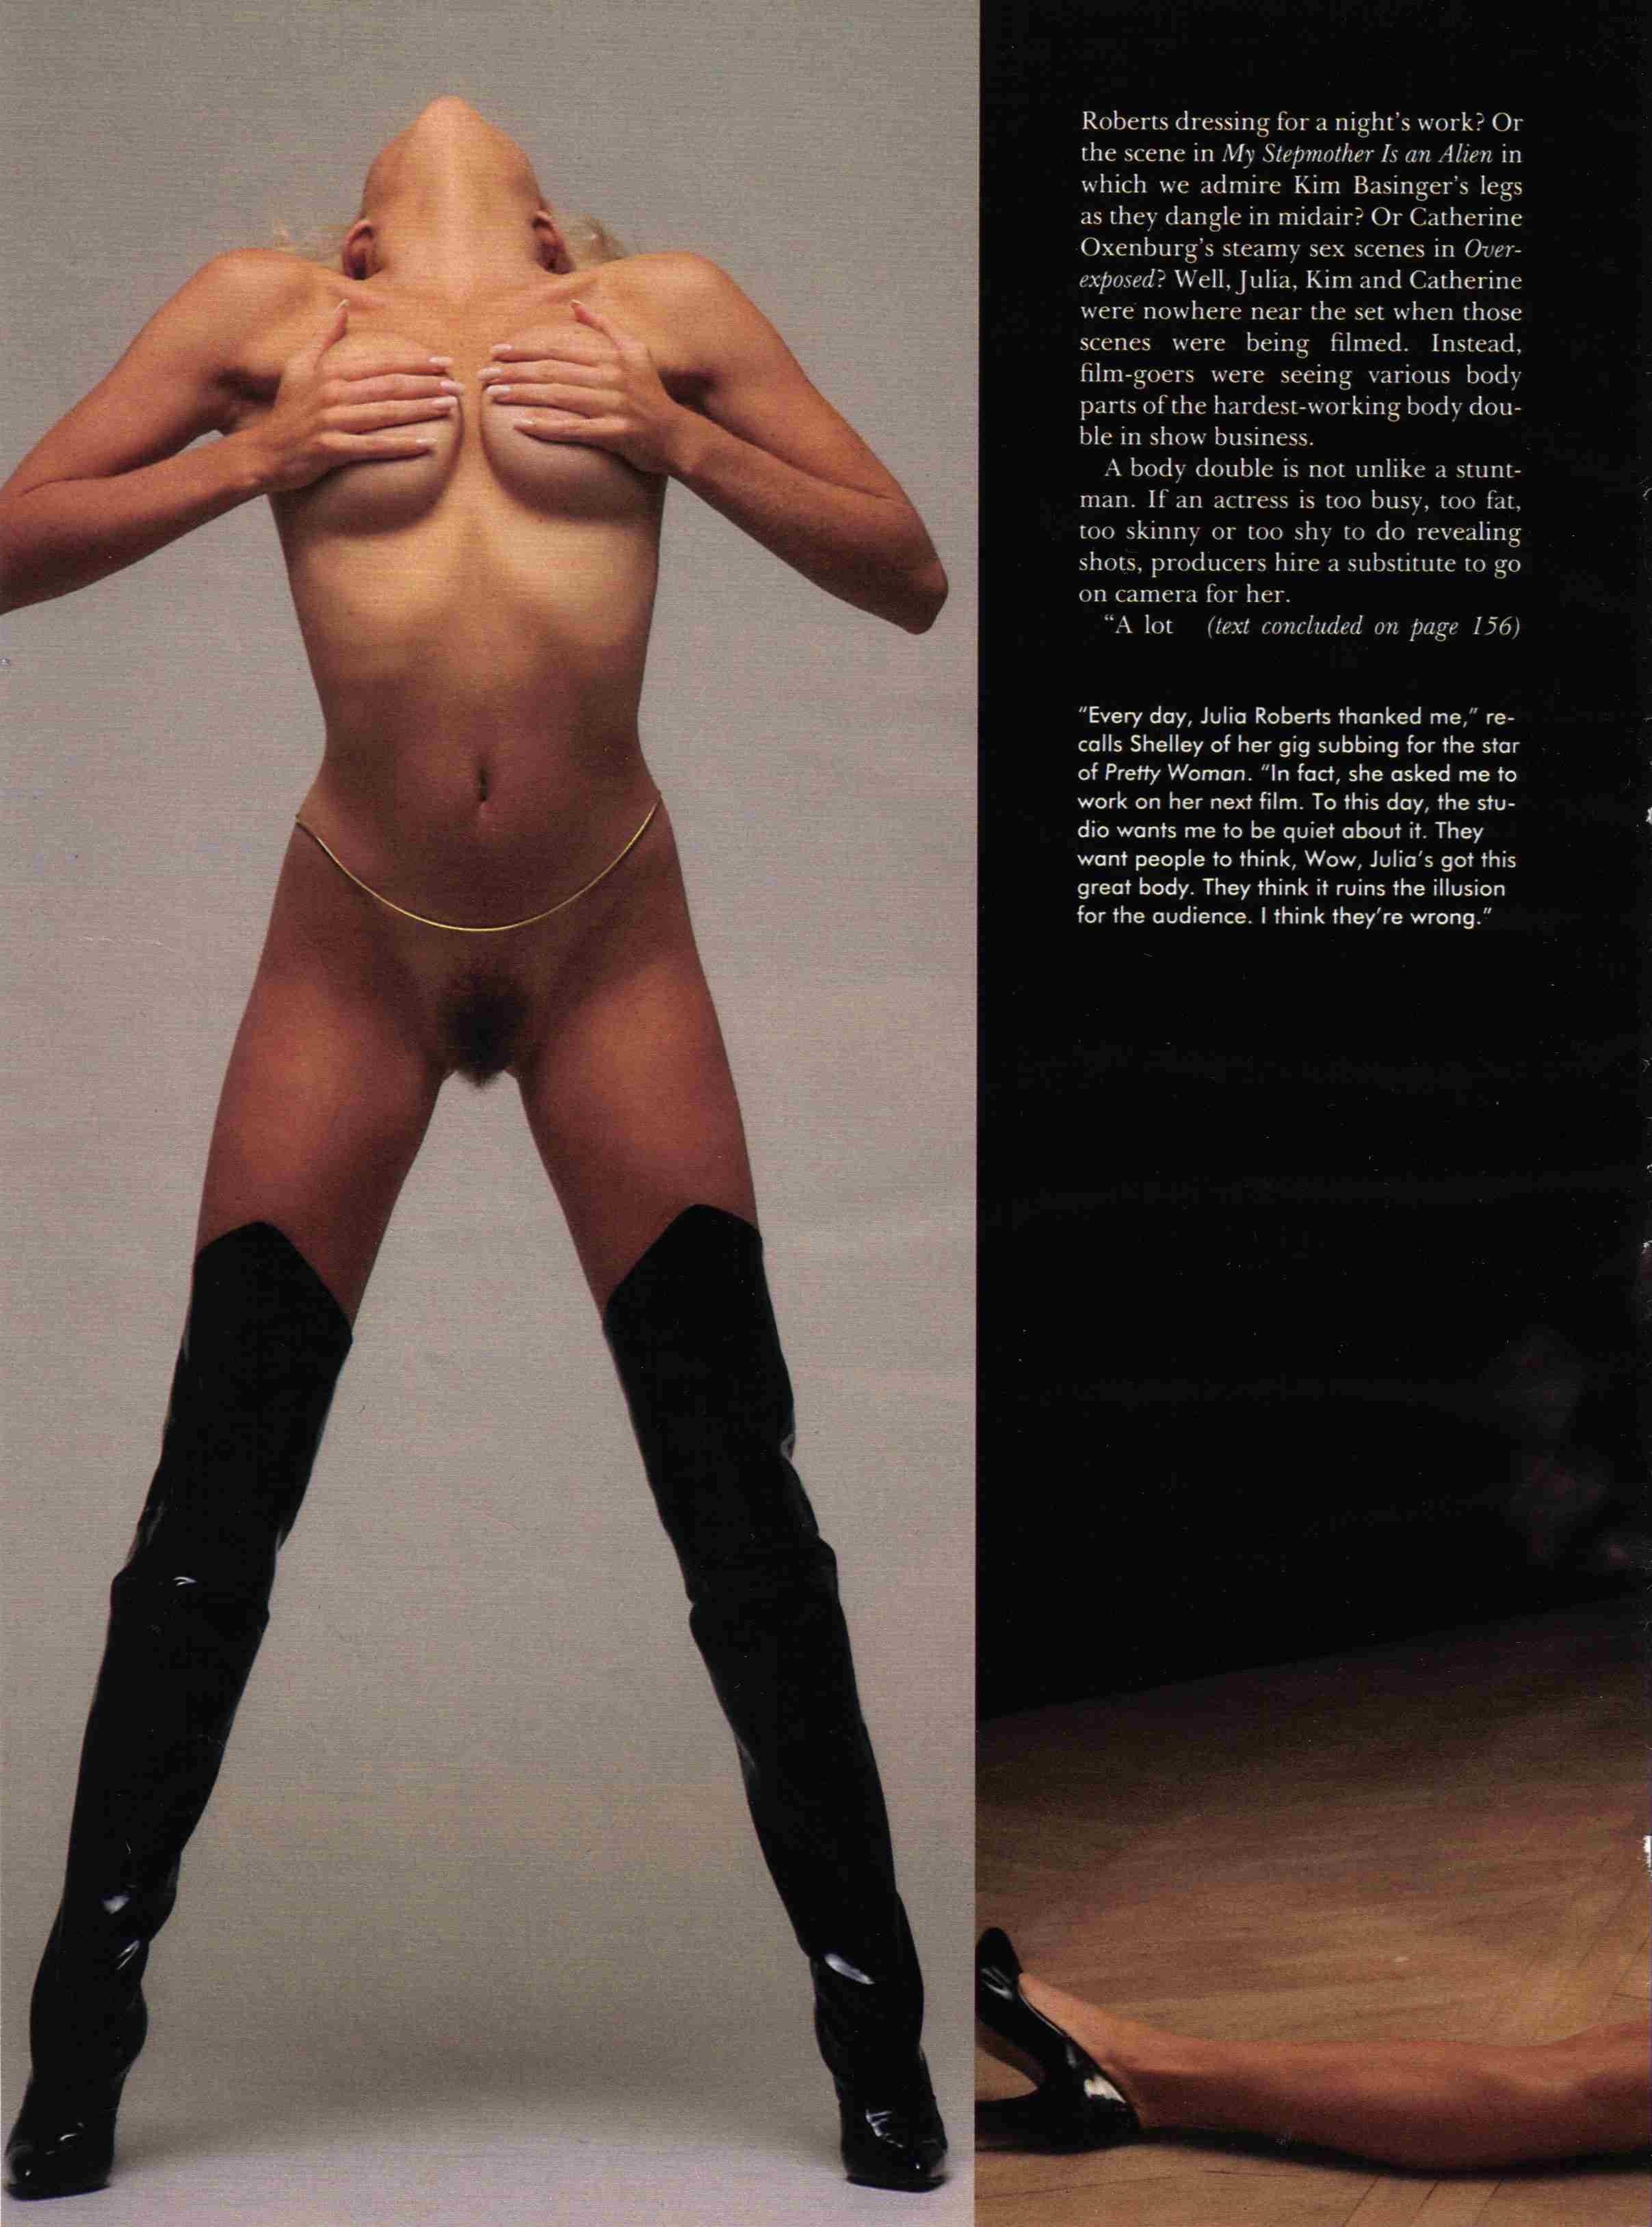 41964_Playboy1992_04_page22_123_132lo.jpg